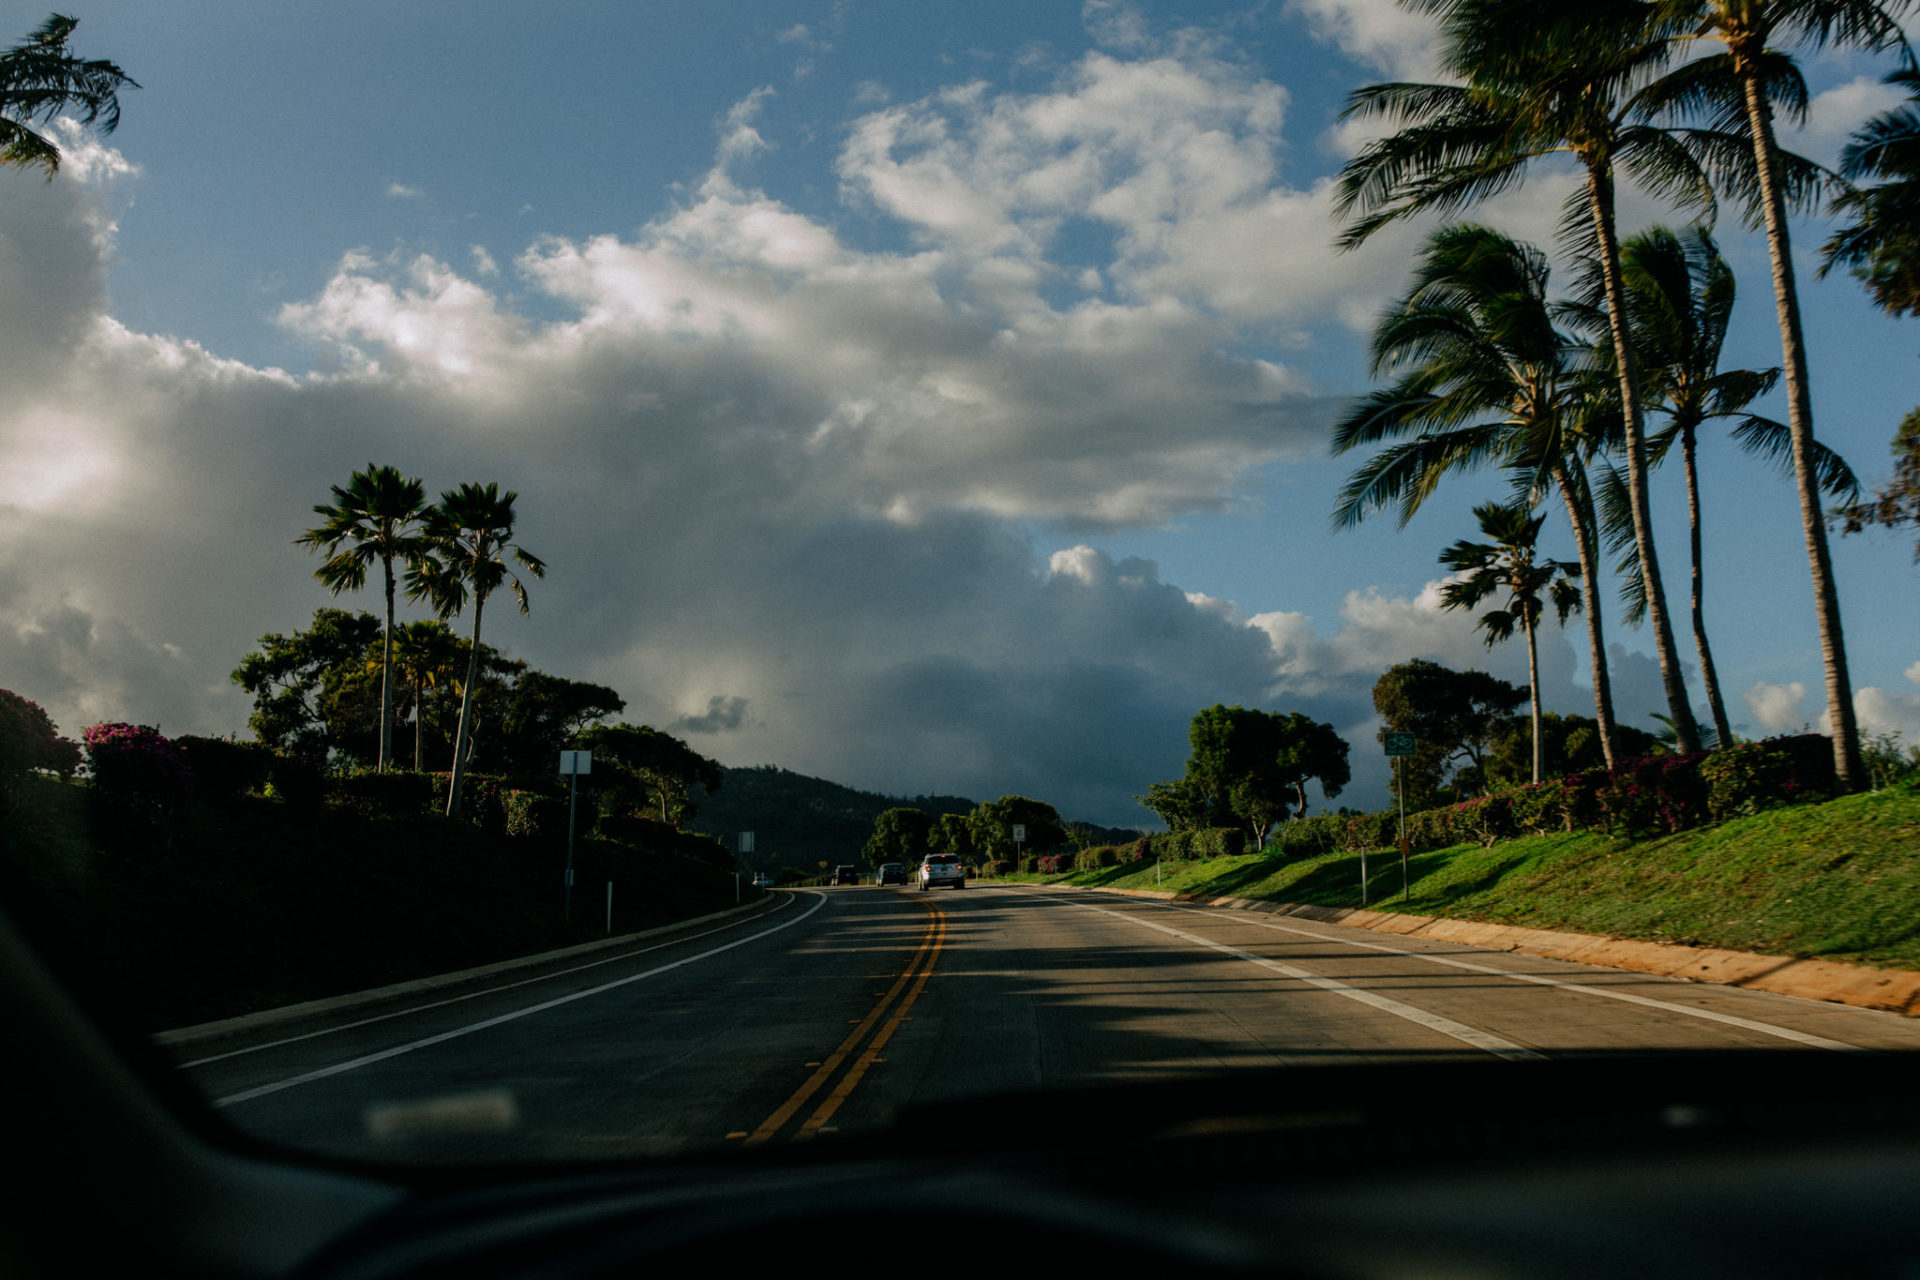 Hawaii Hochzeit-destination wedding kauai landschaften